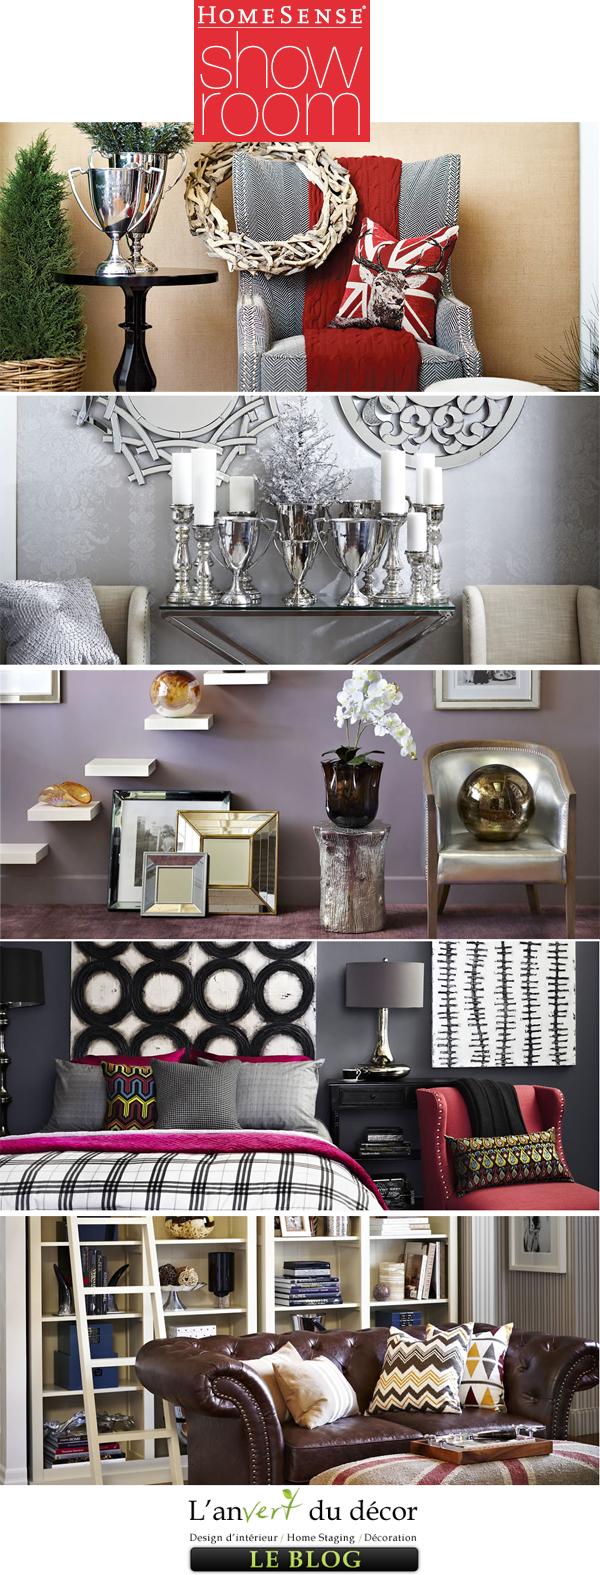 showroom home sense automne 2012 l 39 an vert du d cor. Black Bedroom Furniture Sets. Home Design Ideas